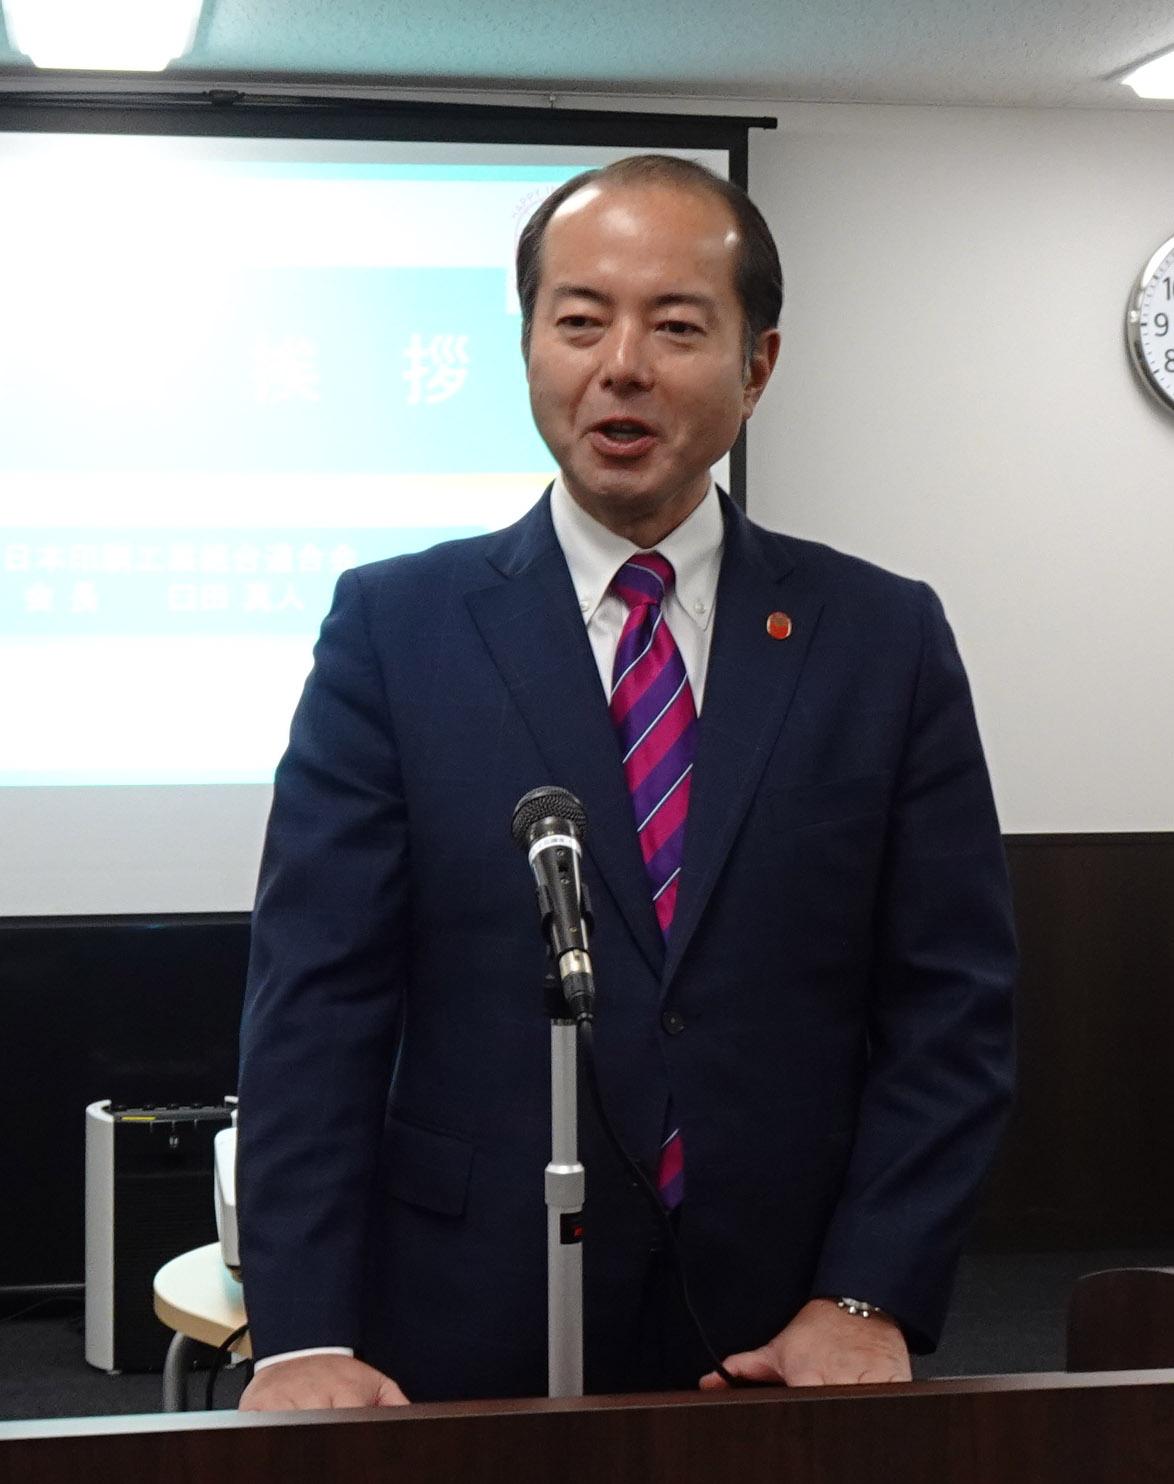 主催者挨拶する全印工連の臼田真人会長